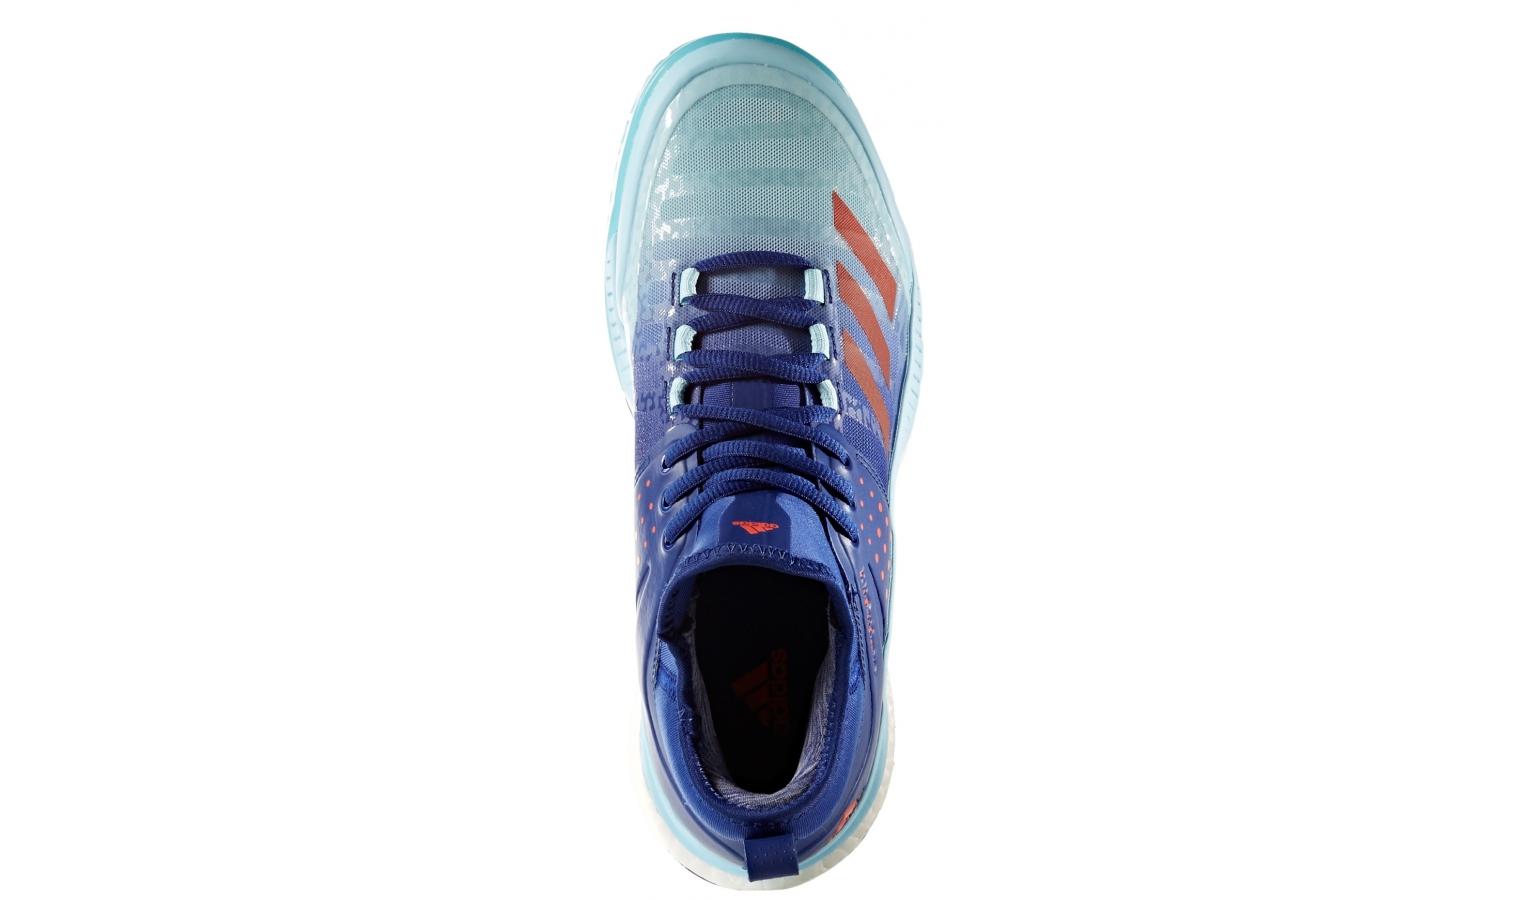 f54310fddb8 ... Dámske volejbalové topánky adidas CRAZYFLIGHT X MID W modré. 0 EUR